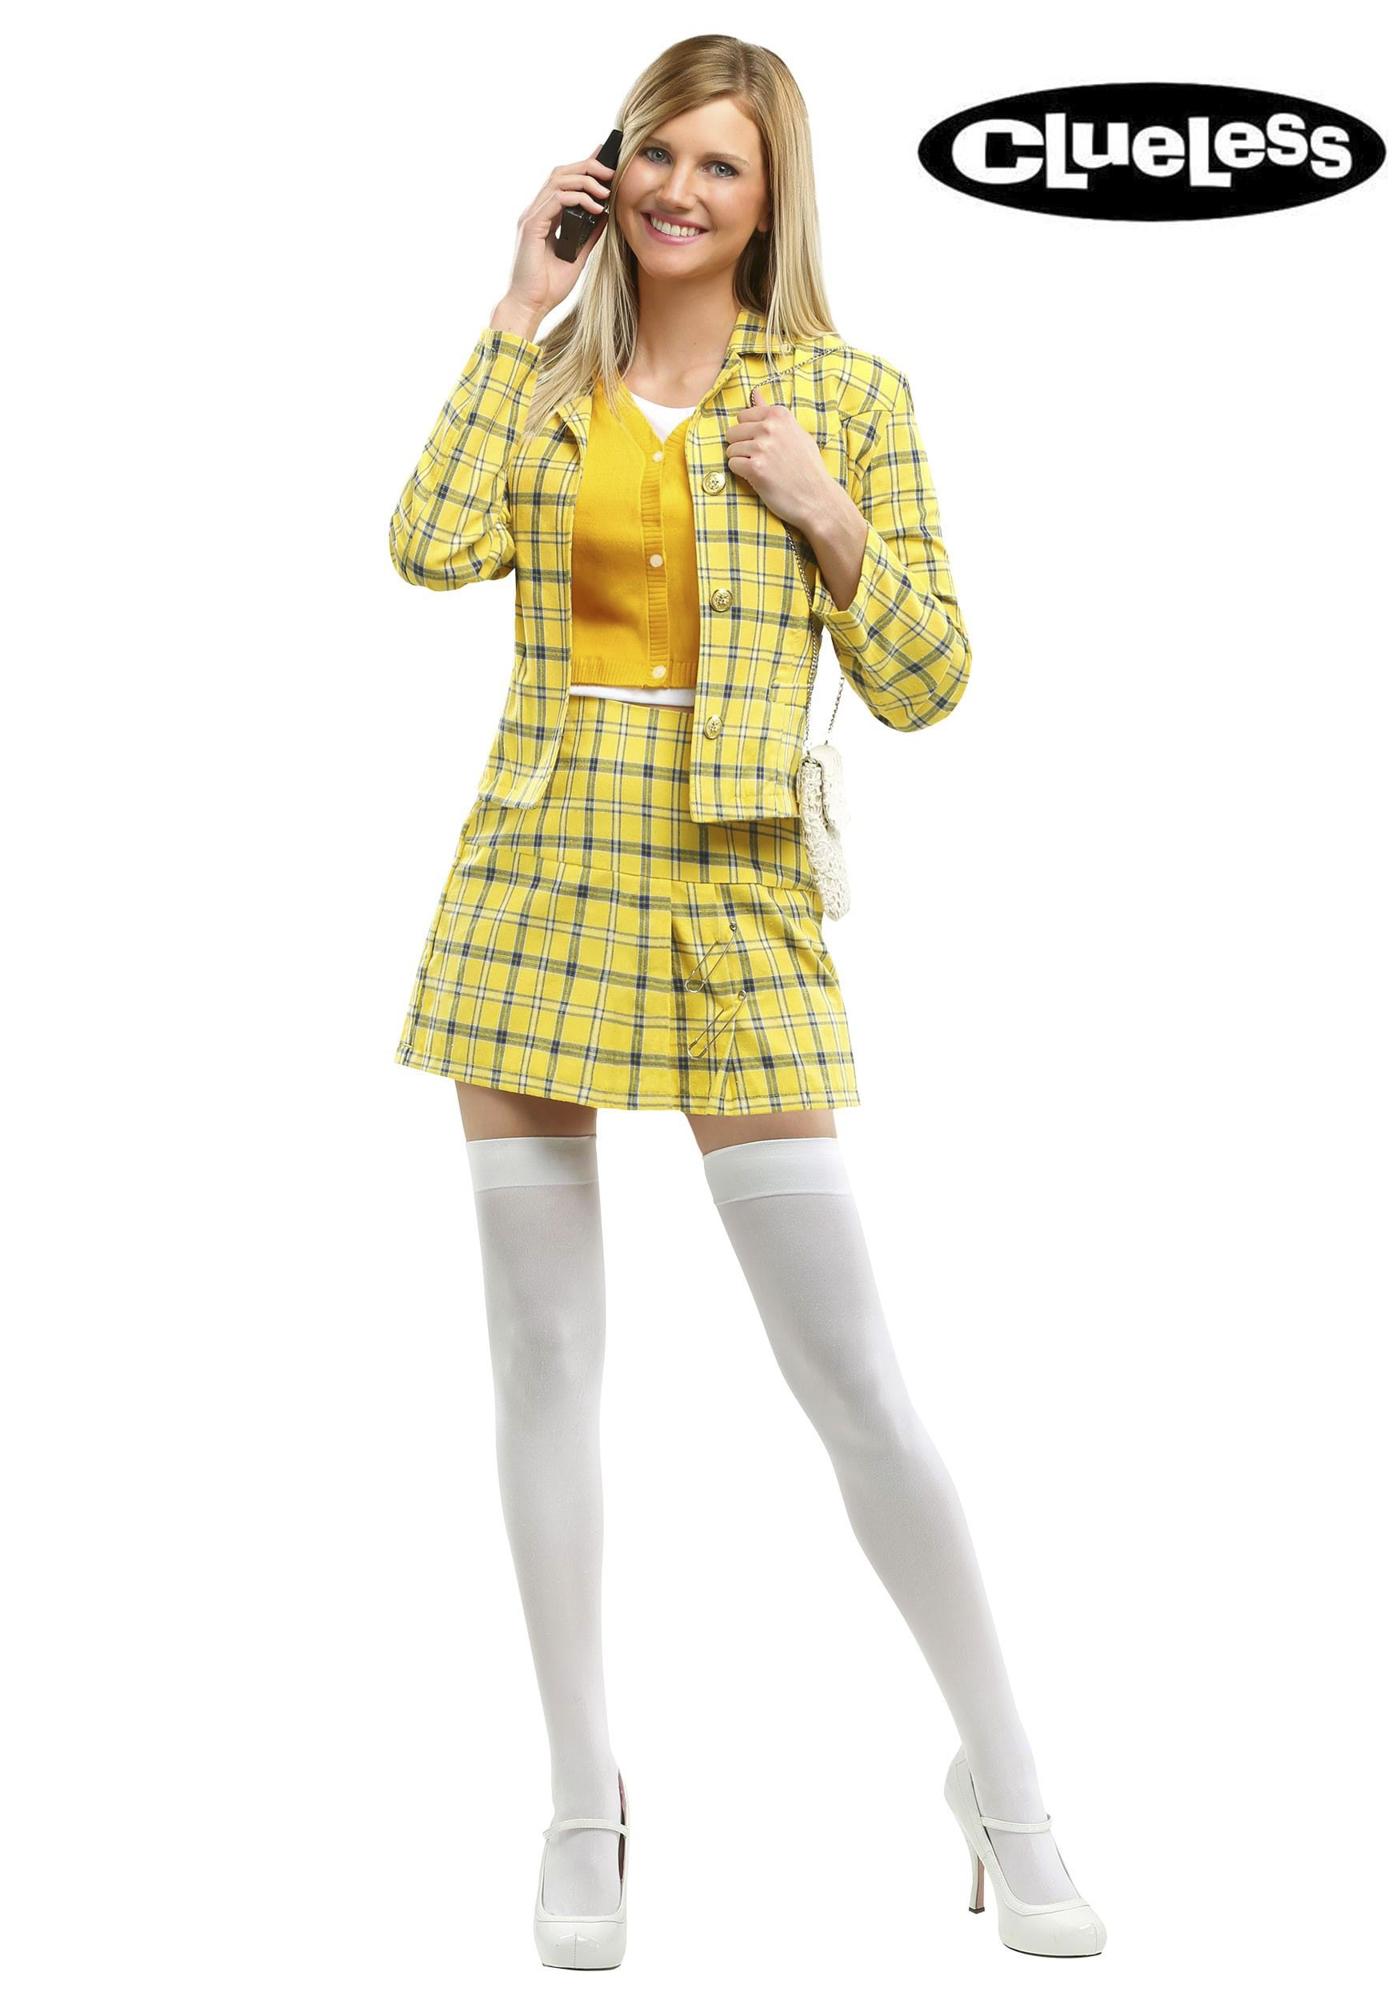 Clueless Cher Women's Costume